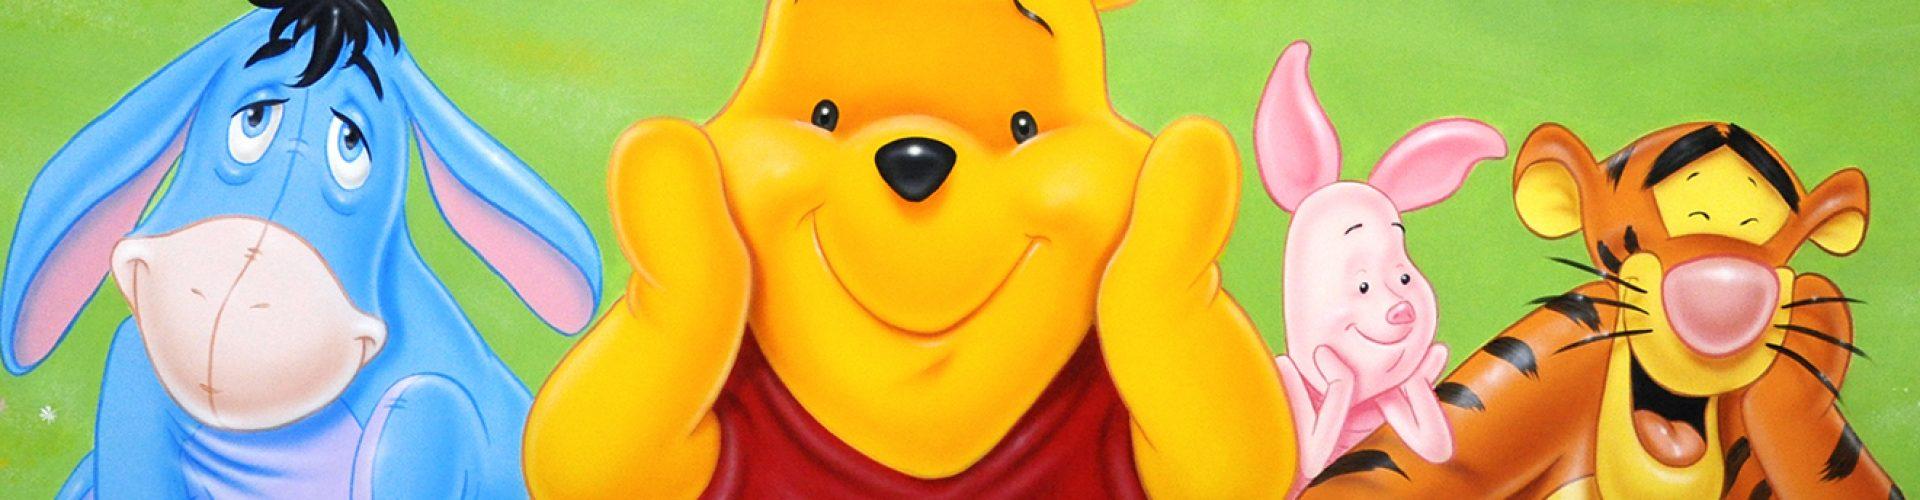 bn_winnie_pooh